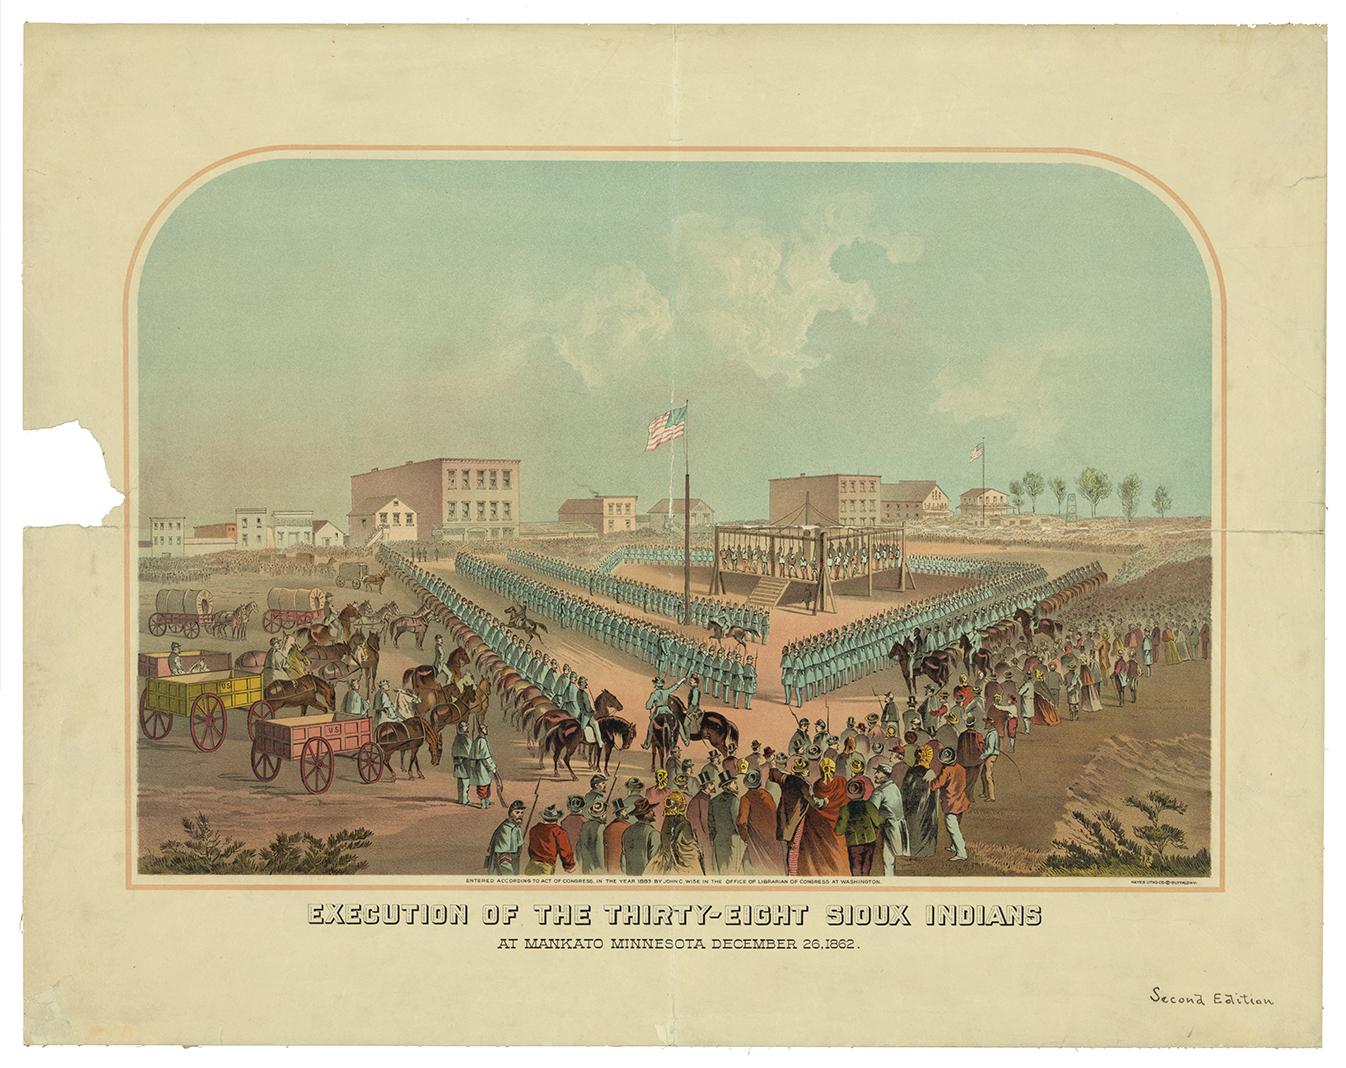 Lithograph of the execution of 38 Dakota men,